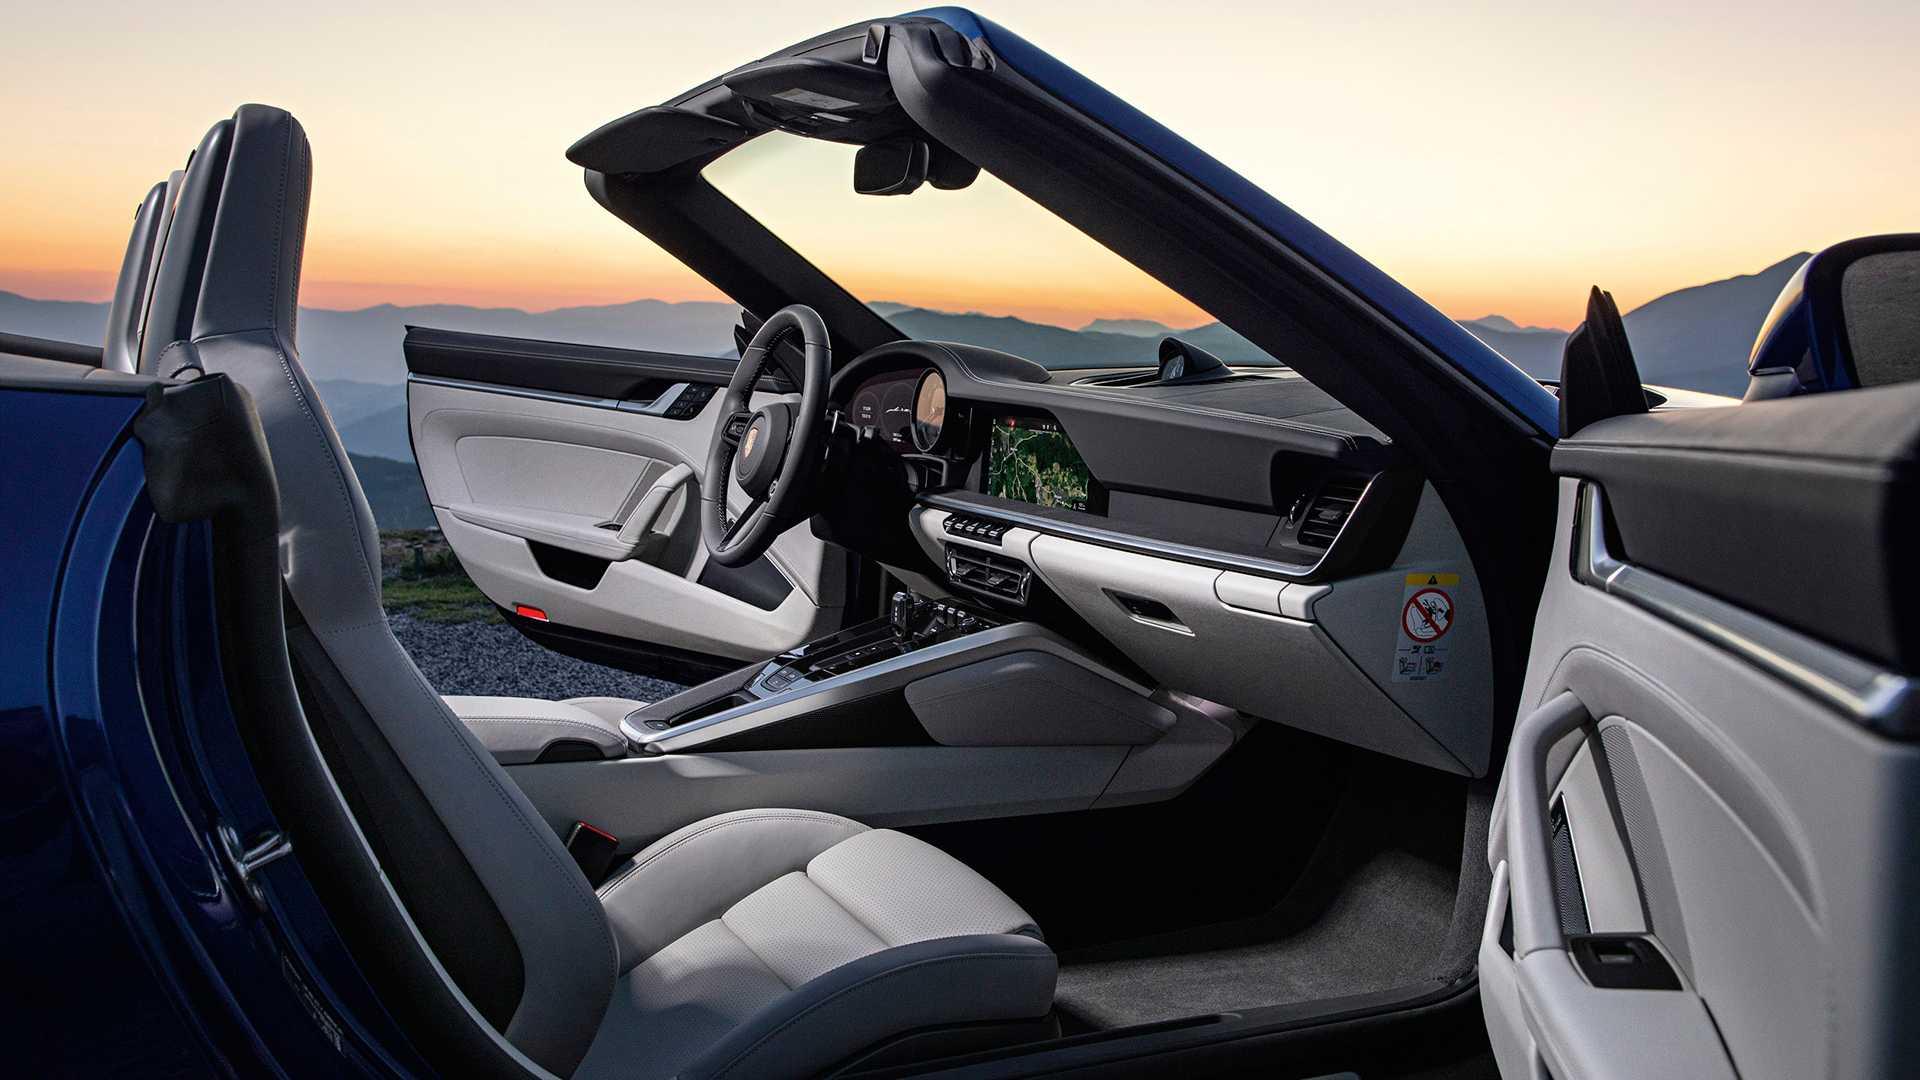 2020-porsche-911-cabriolet-trinh-lang-5.jpg